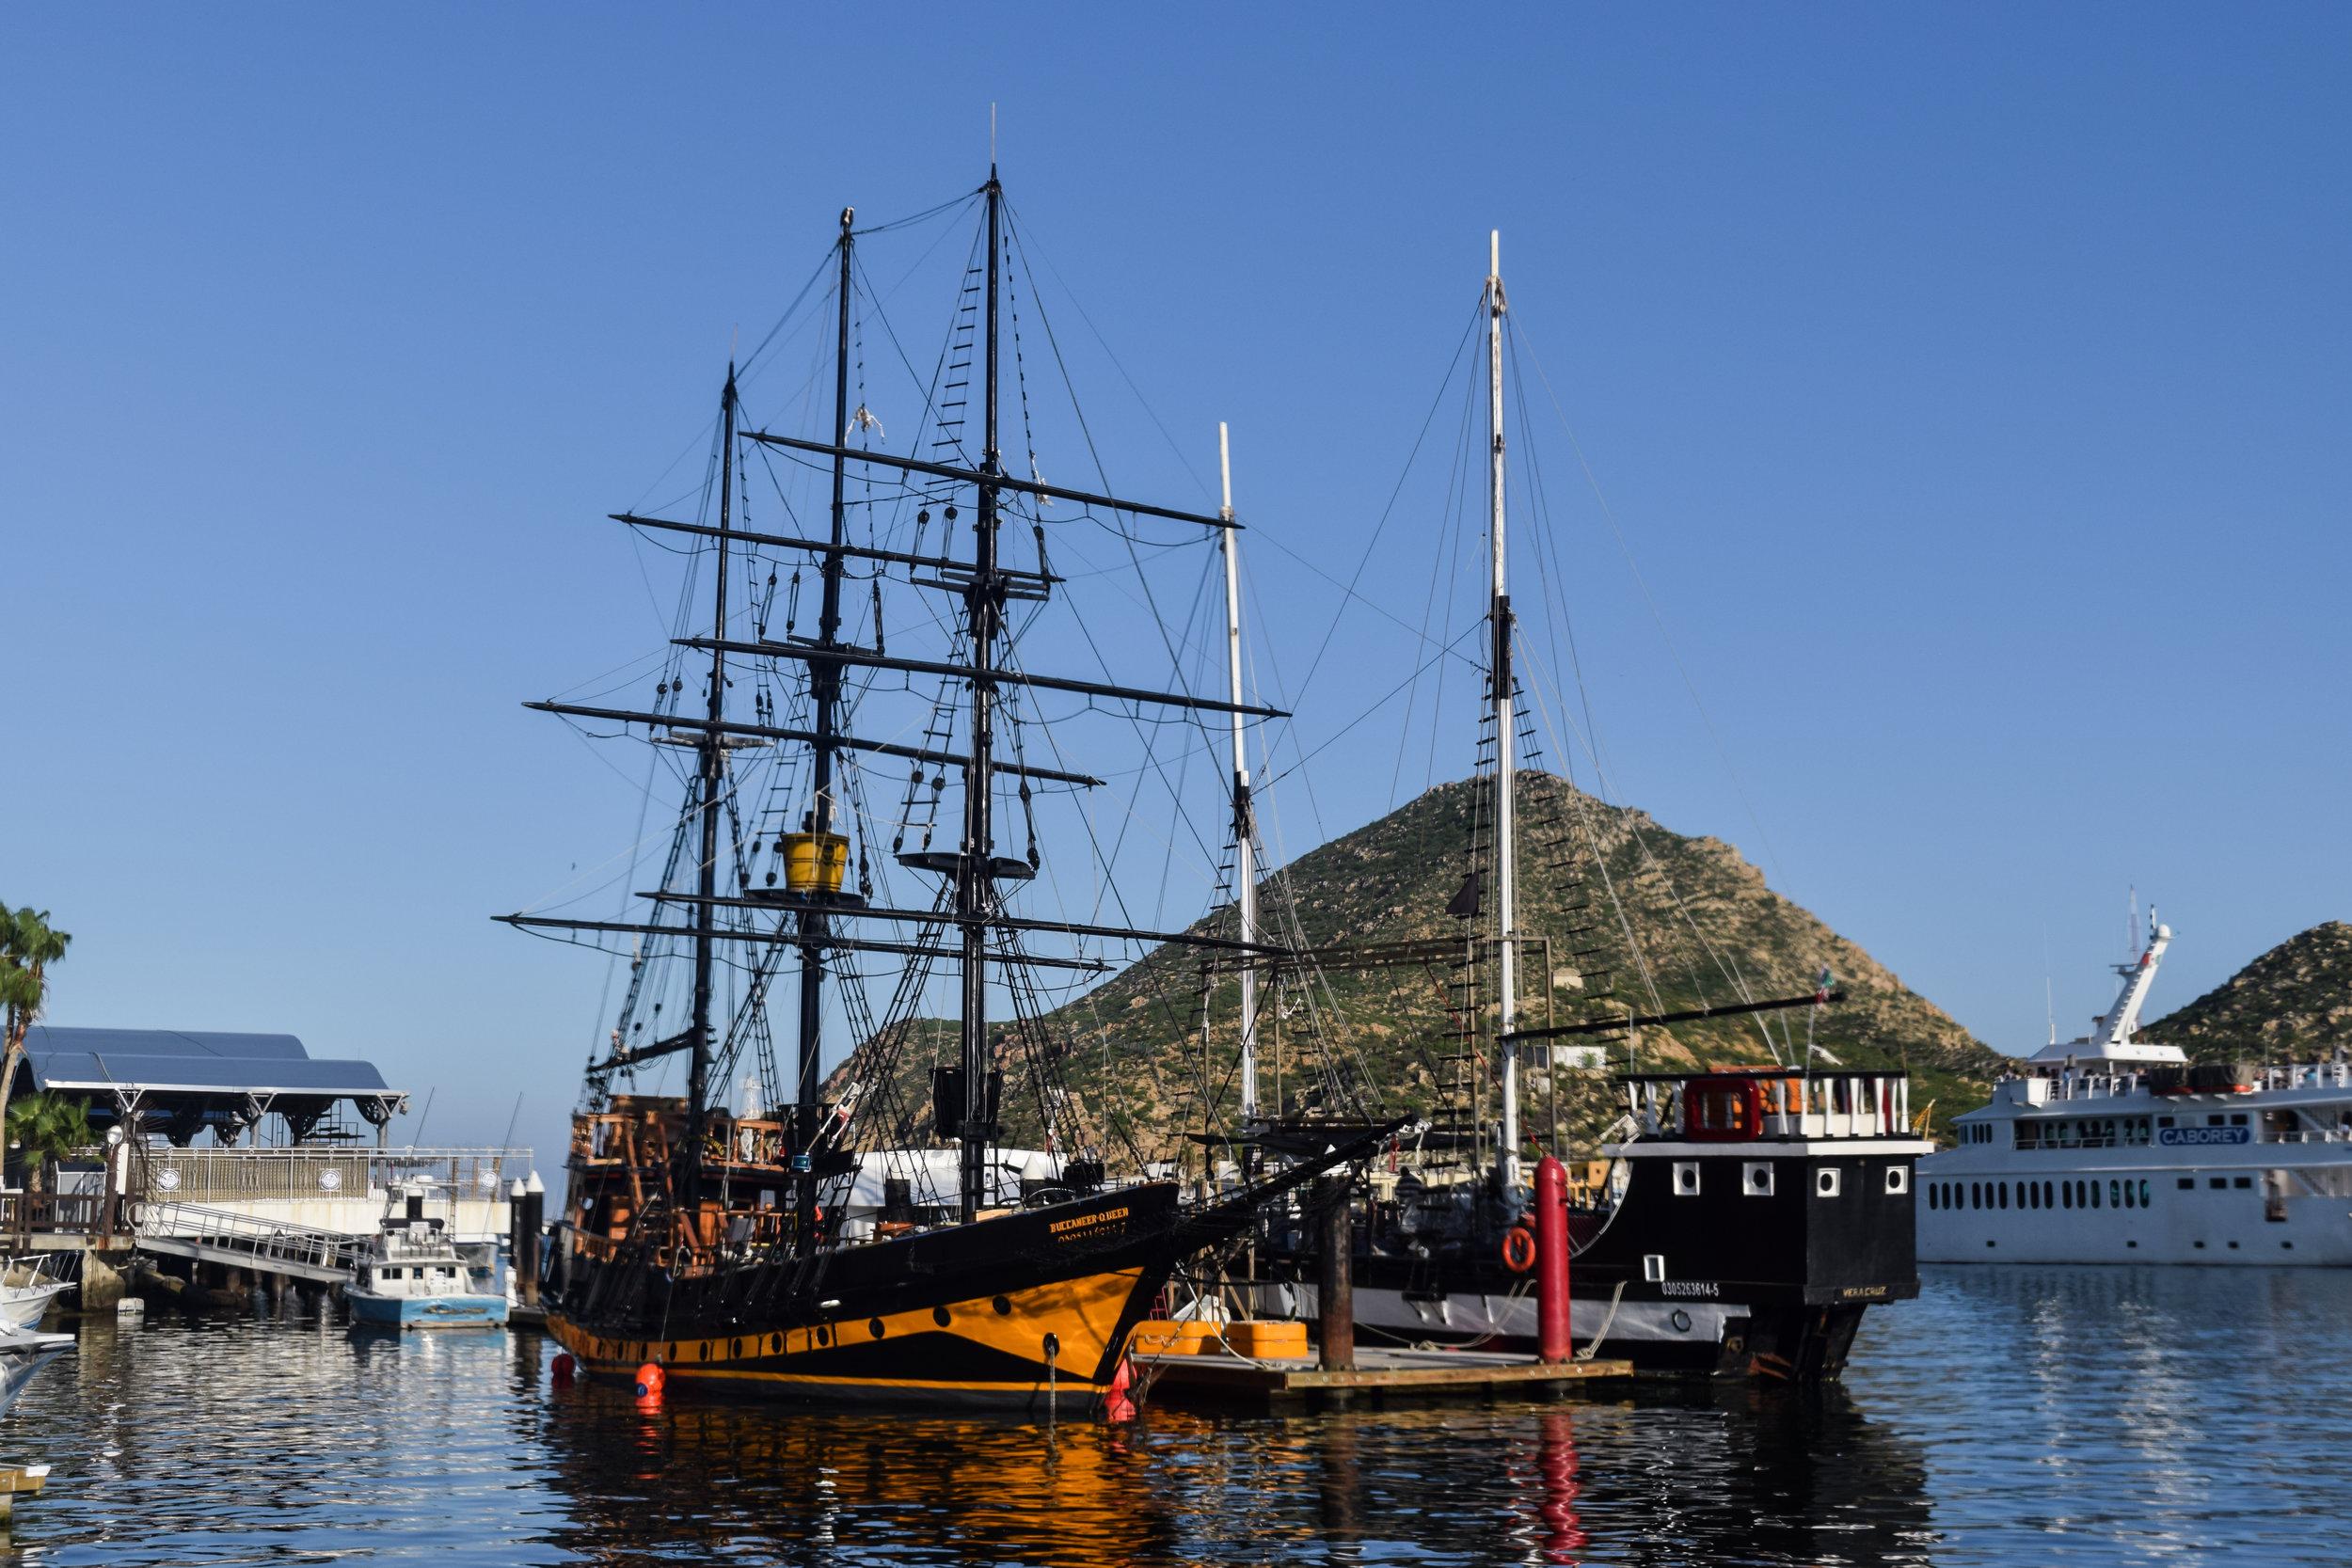 Edited Pirate Ship (1).jpg